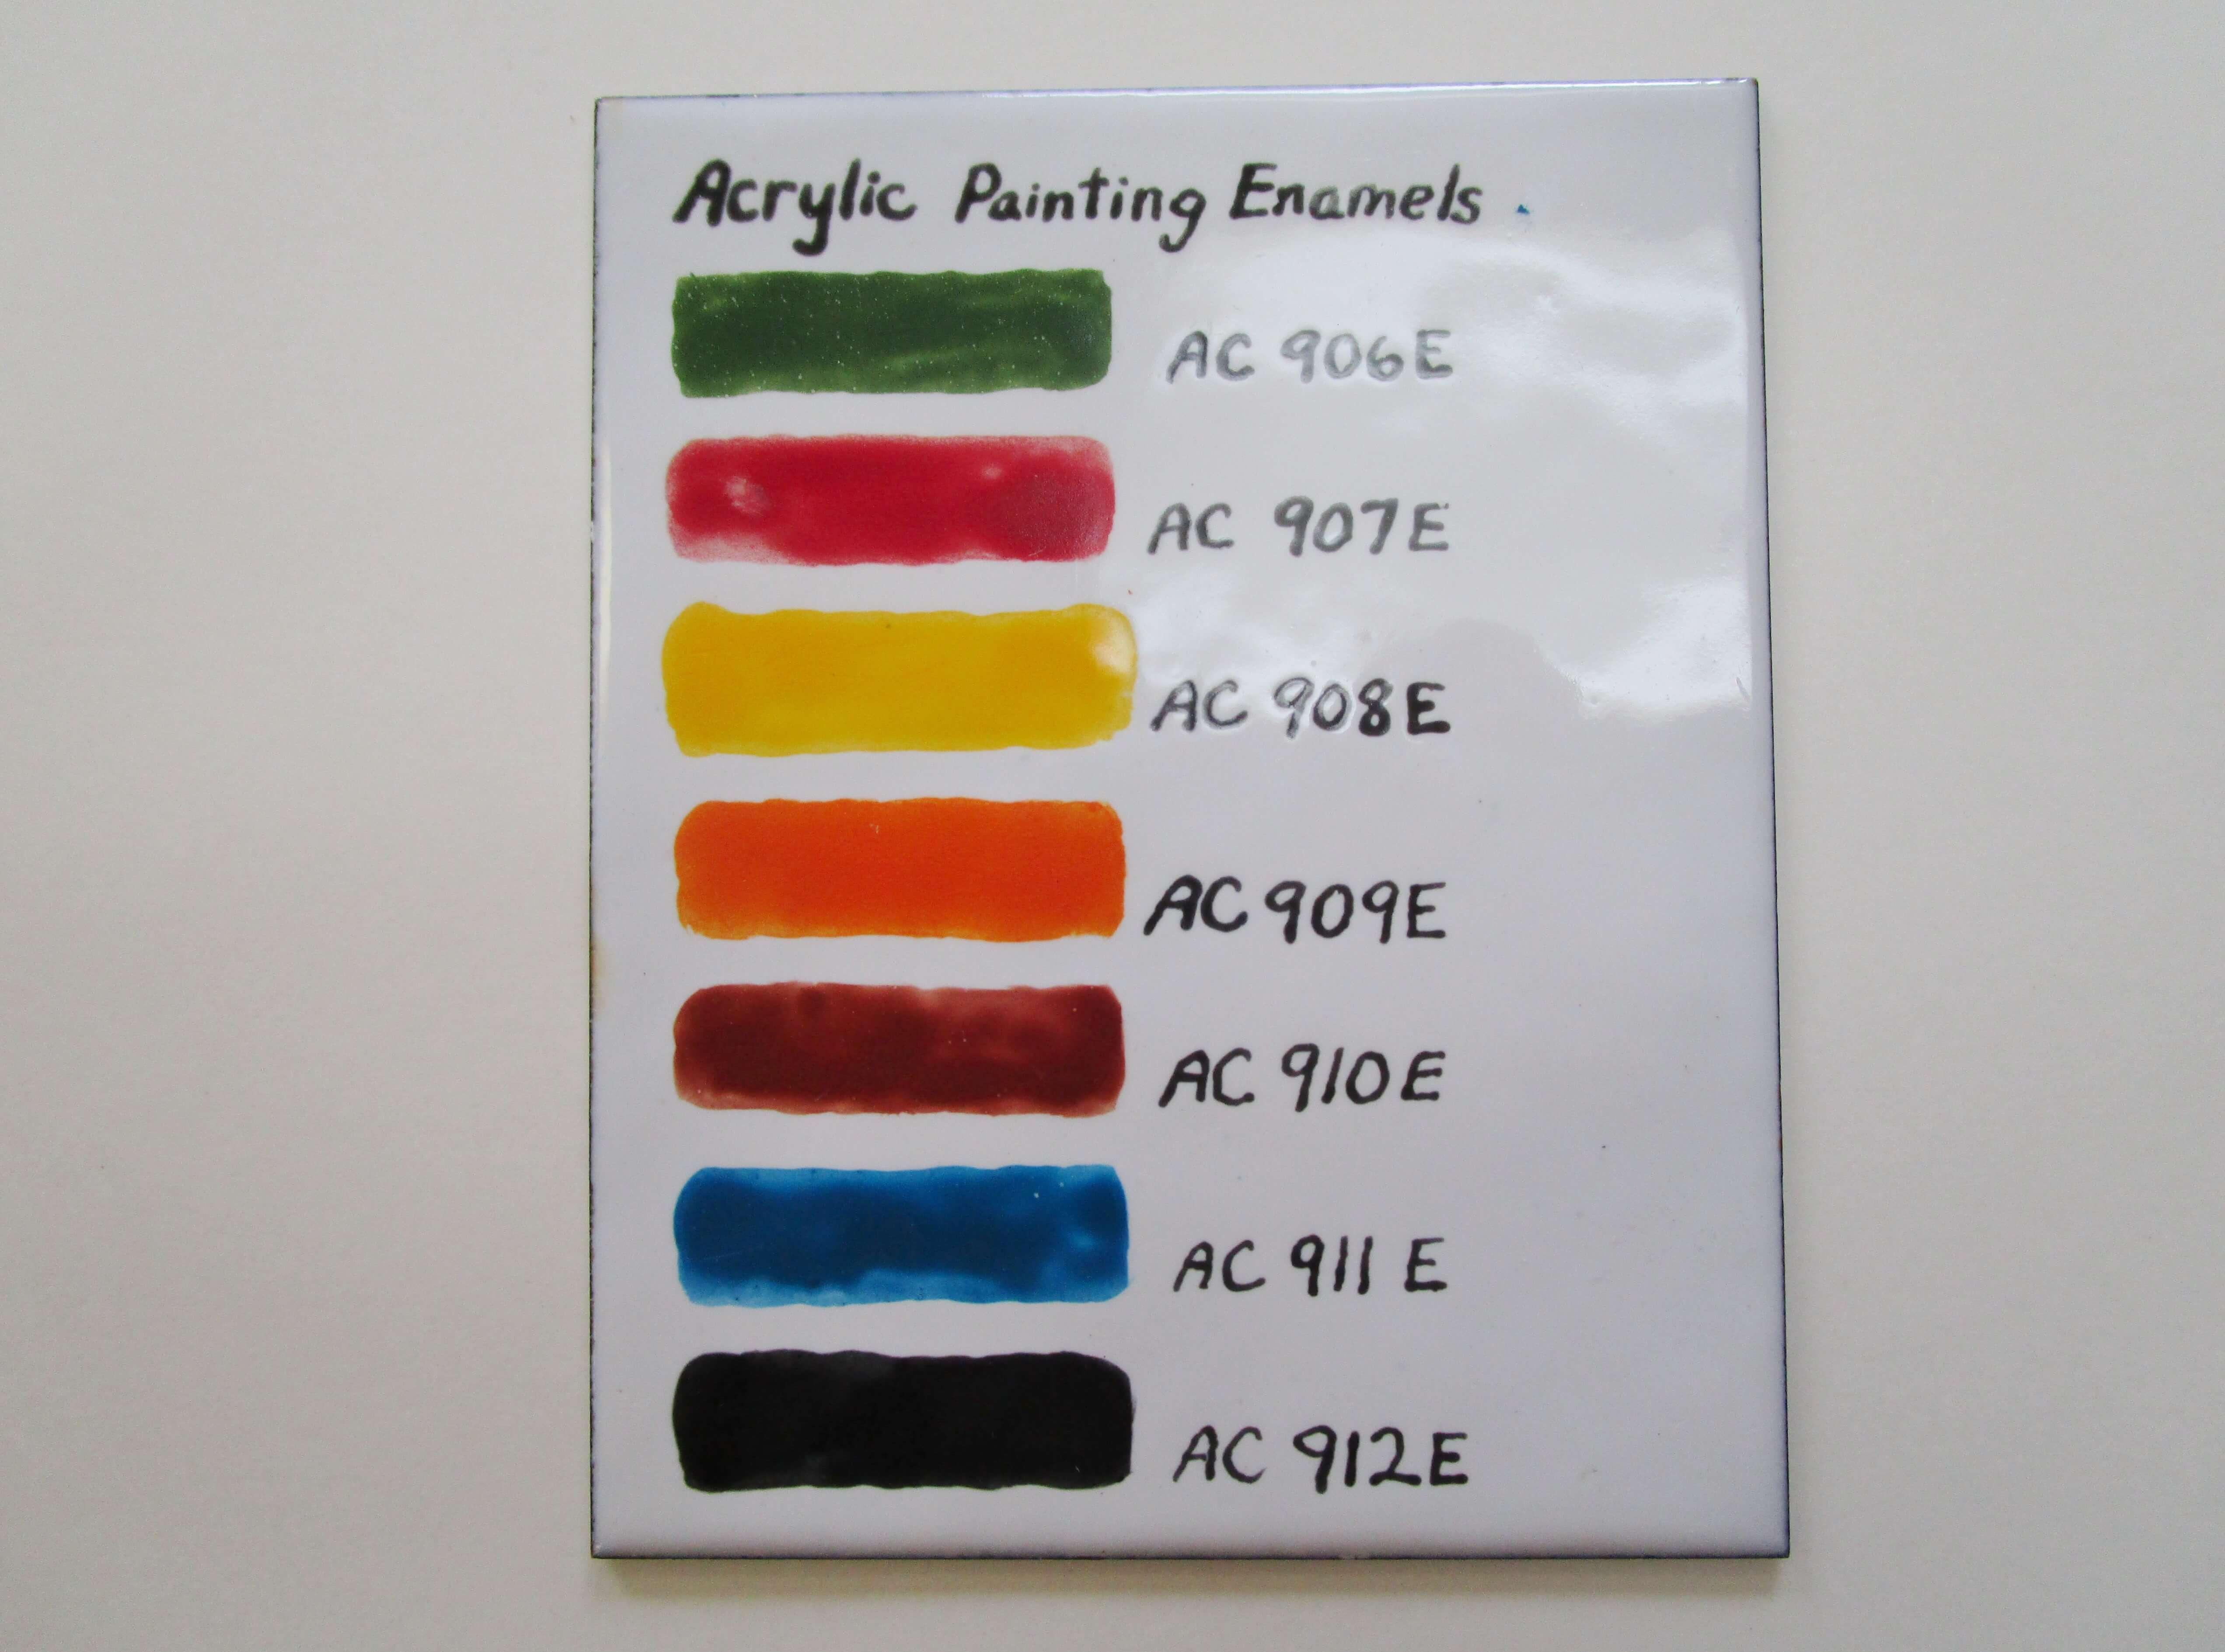 Acrylic Enamel Paint >> Acrylic Enamel